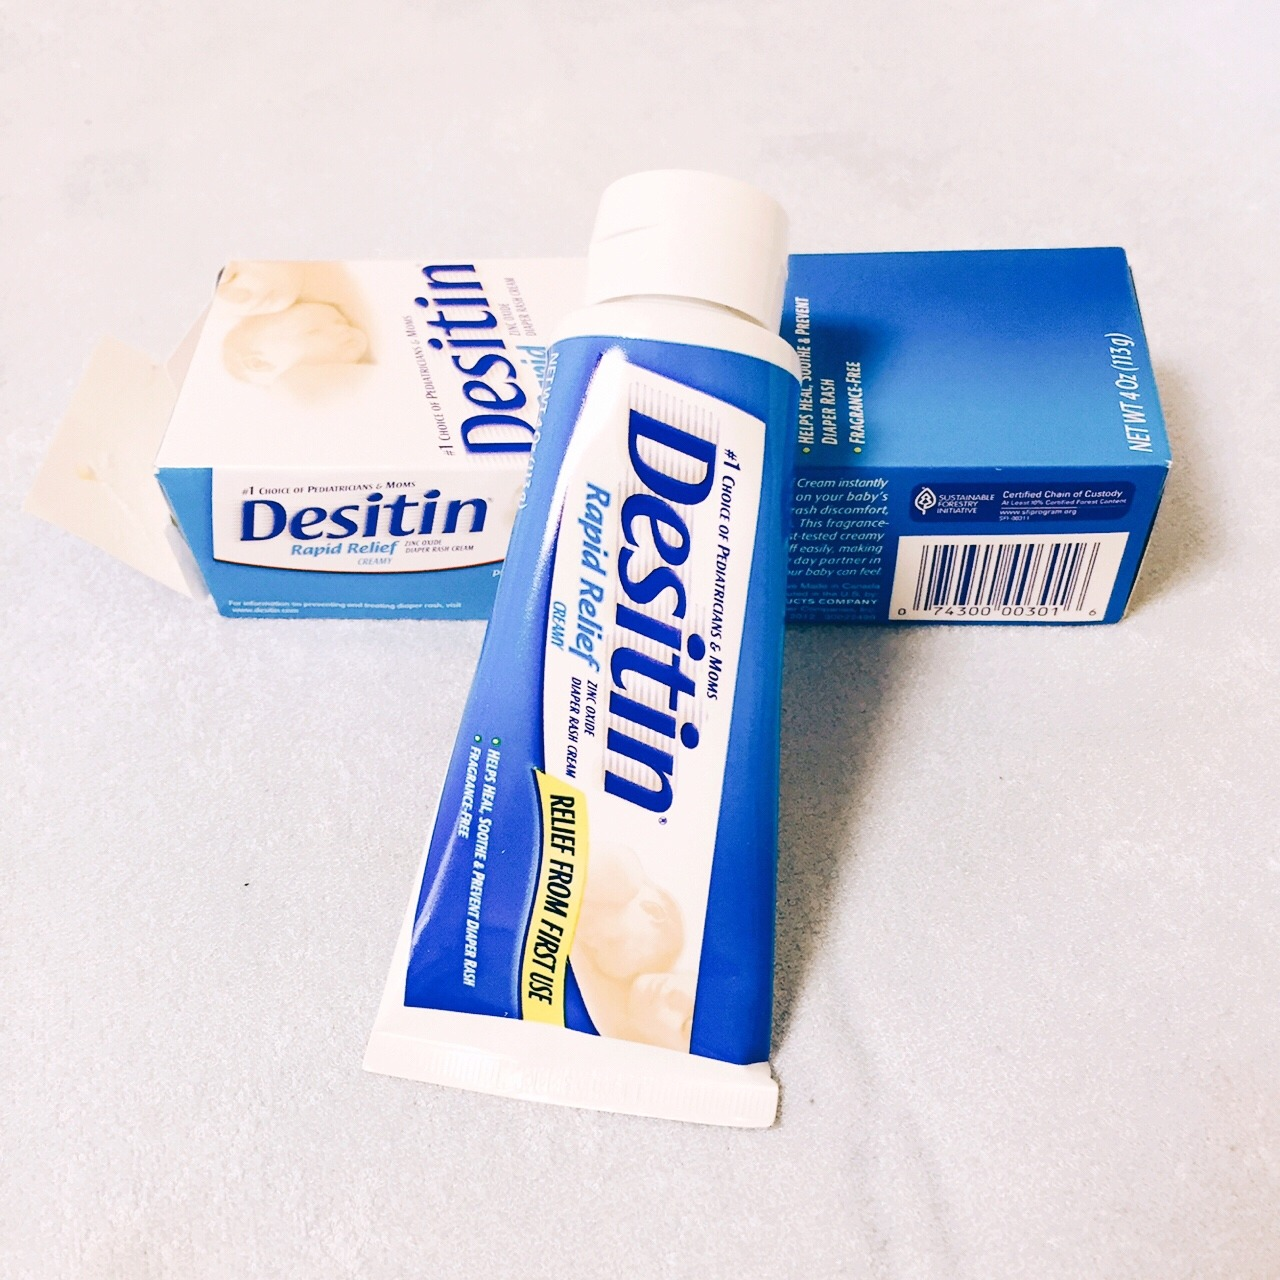 Desitin 婴儿护臀膏: 身边很多麻麻都跟我推荐过这款婴儿护臀膏,所以当时准备待产包的时候也没多想,直接就买了。 Desitin家的护臀膏有2款: 图上的蓝色包装款是日常护理使用的,含有10%氧化锌,比较温和。 另一款紫色包装的,含有40%氧化锌,具有很好消炎收敛的作用,比较适合红PP严重的宝宝。 当然,两款都含芦荟和维生素E、低敏,牙膏管的包装用起来也比较方便。 白色膏体(这一点也很像牙膏,哈哈),不像大人的乳液那么好涂开,感觉有粉质在里面,需要多抹几遍。 温馨提示: 有人说每次换尿不湿都要涂屁屁